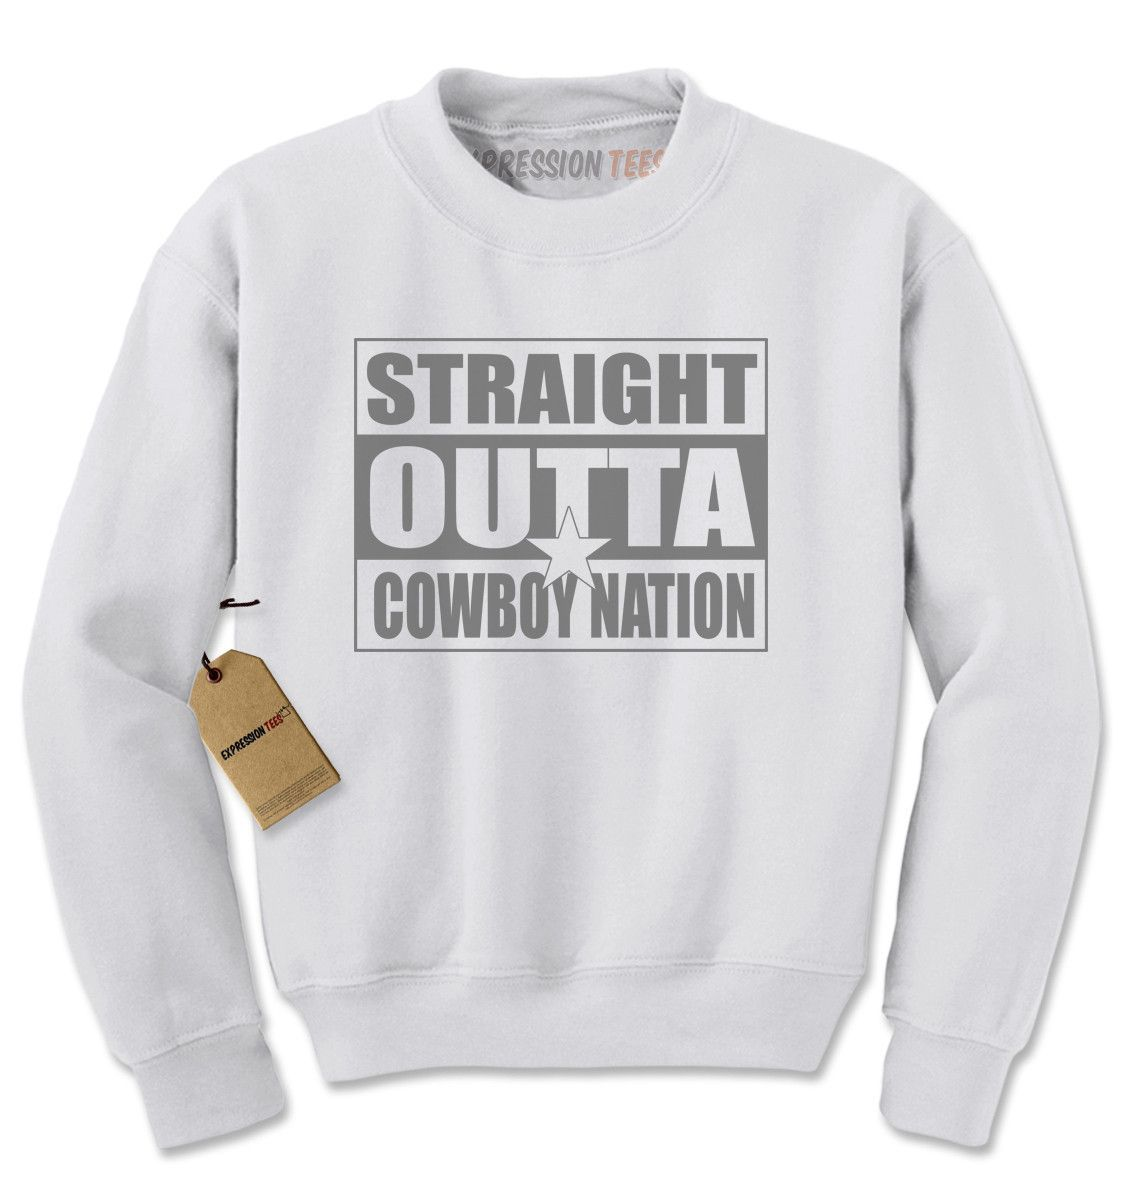 Straight Outta Cowboys Nation Football Adult Crewneck Sweatshirt